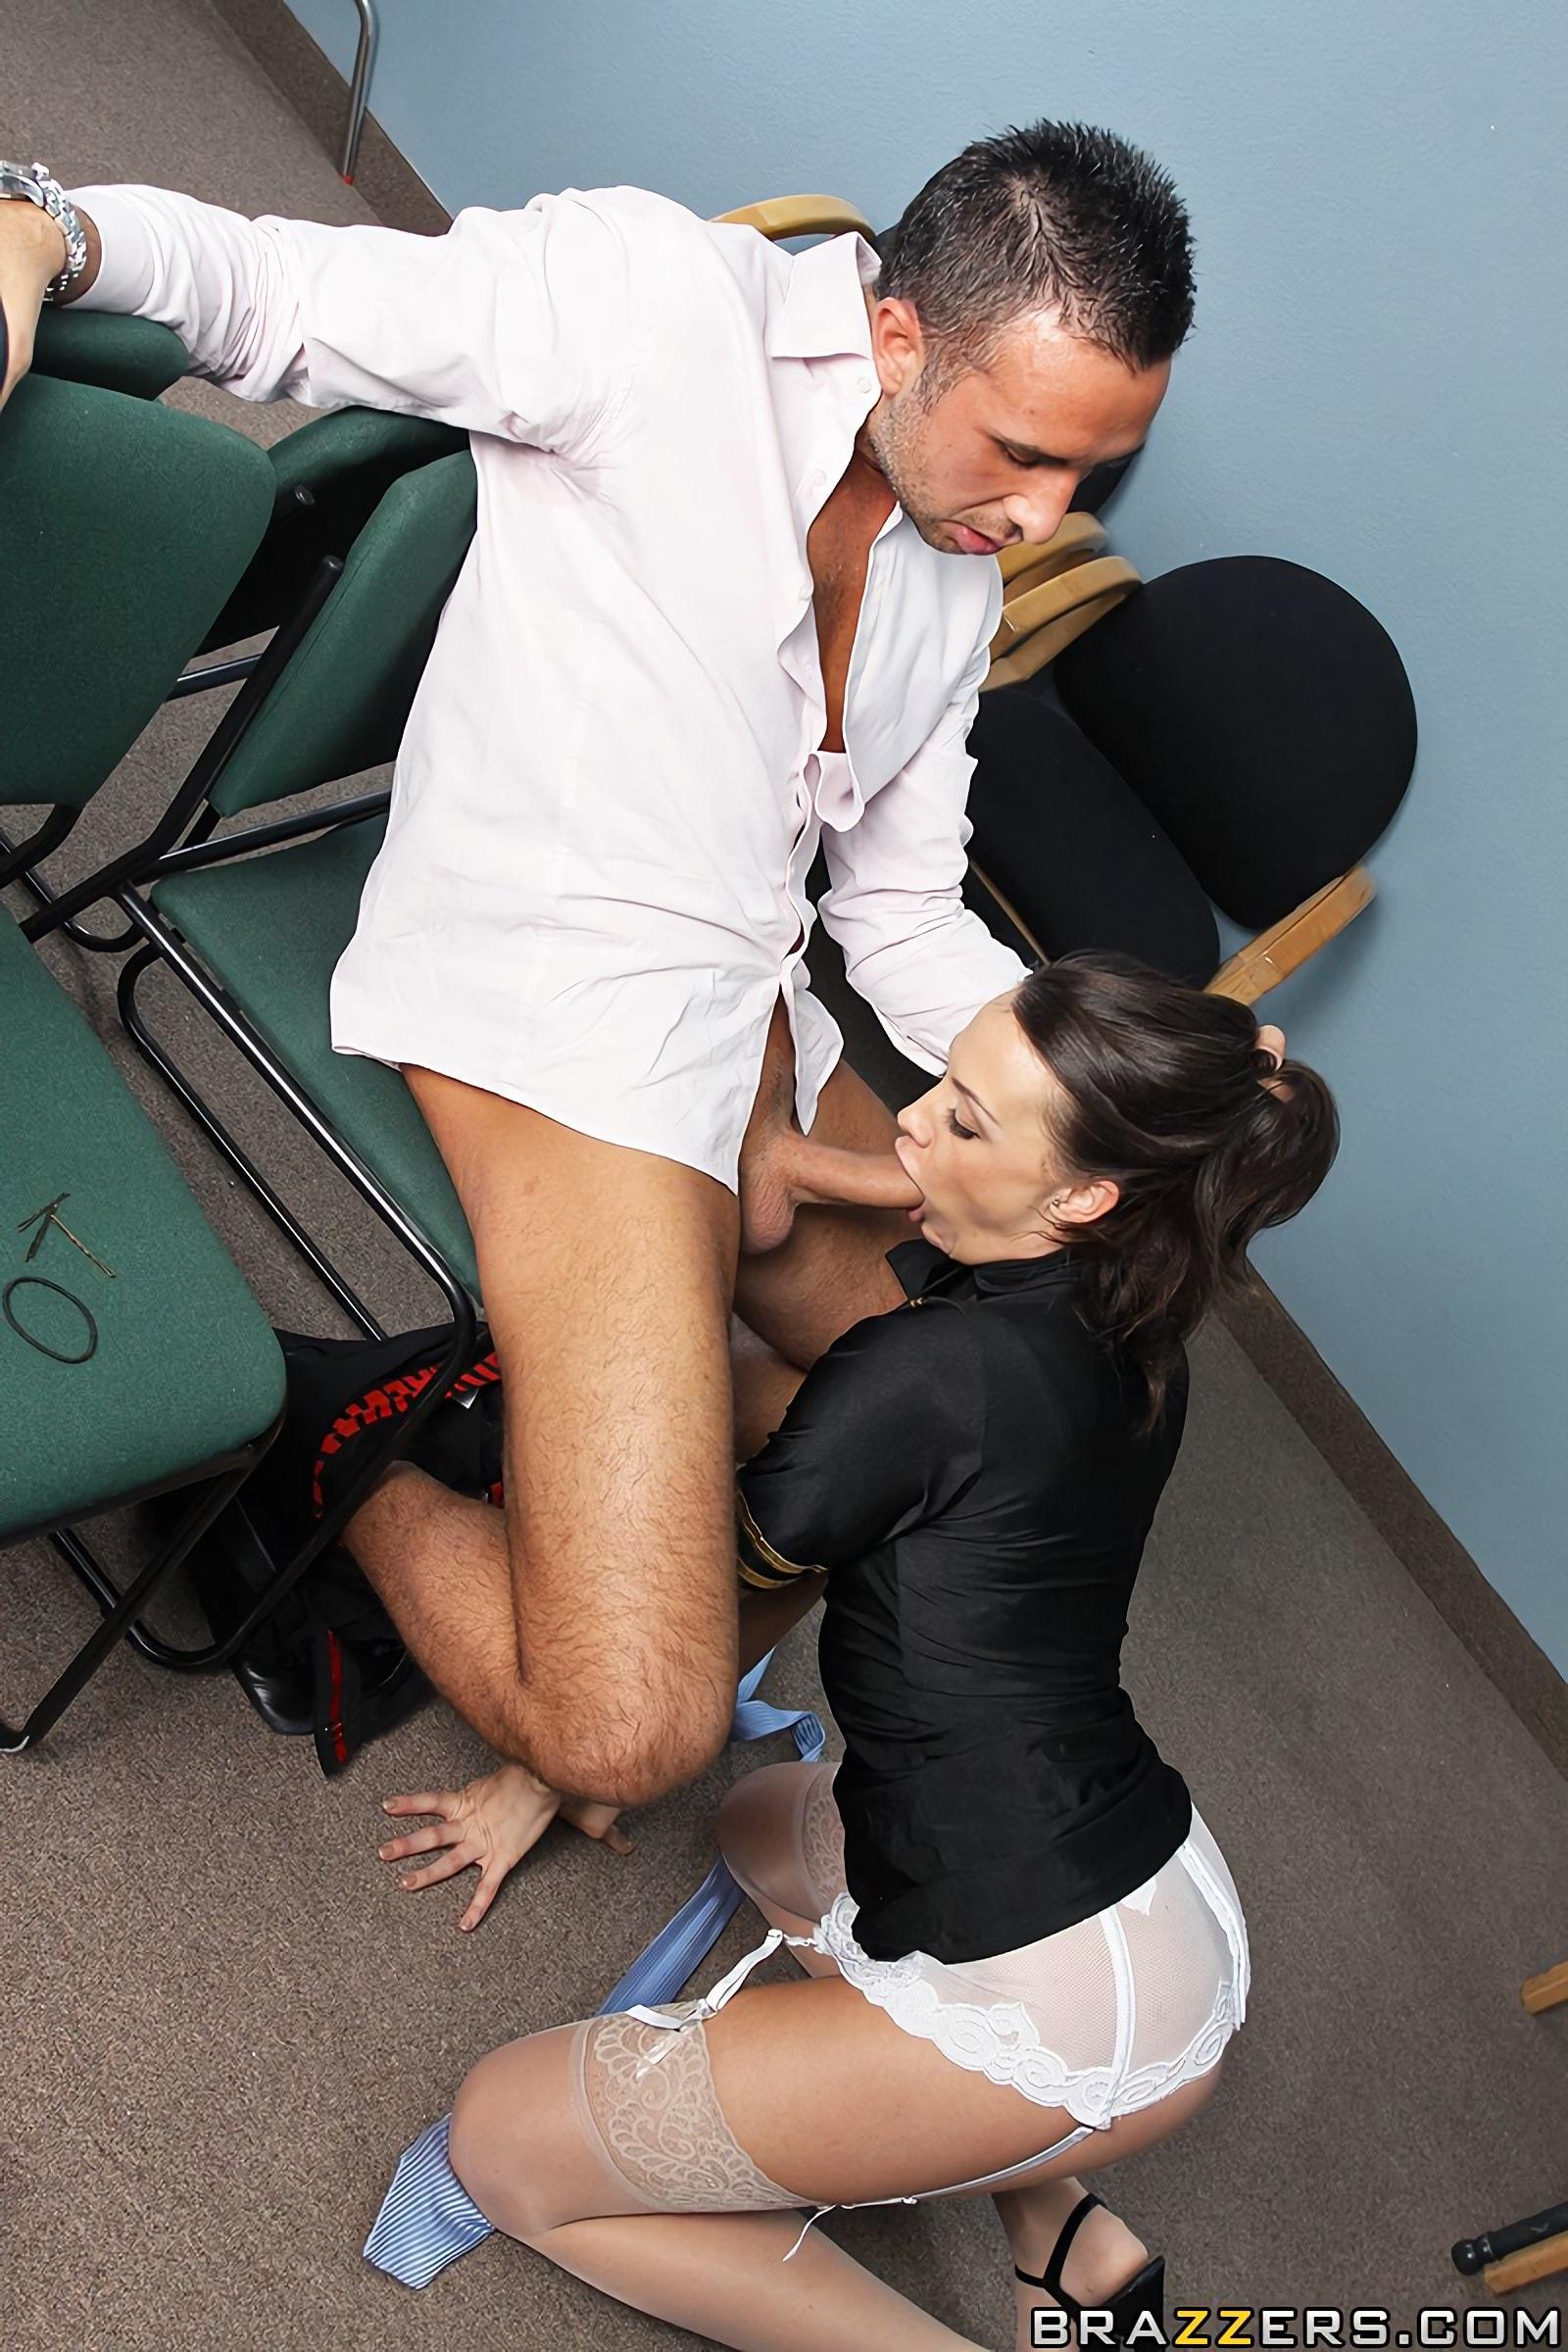 styuardessi-v-chulkah-seks